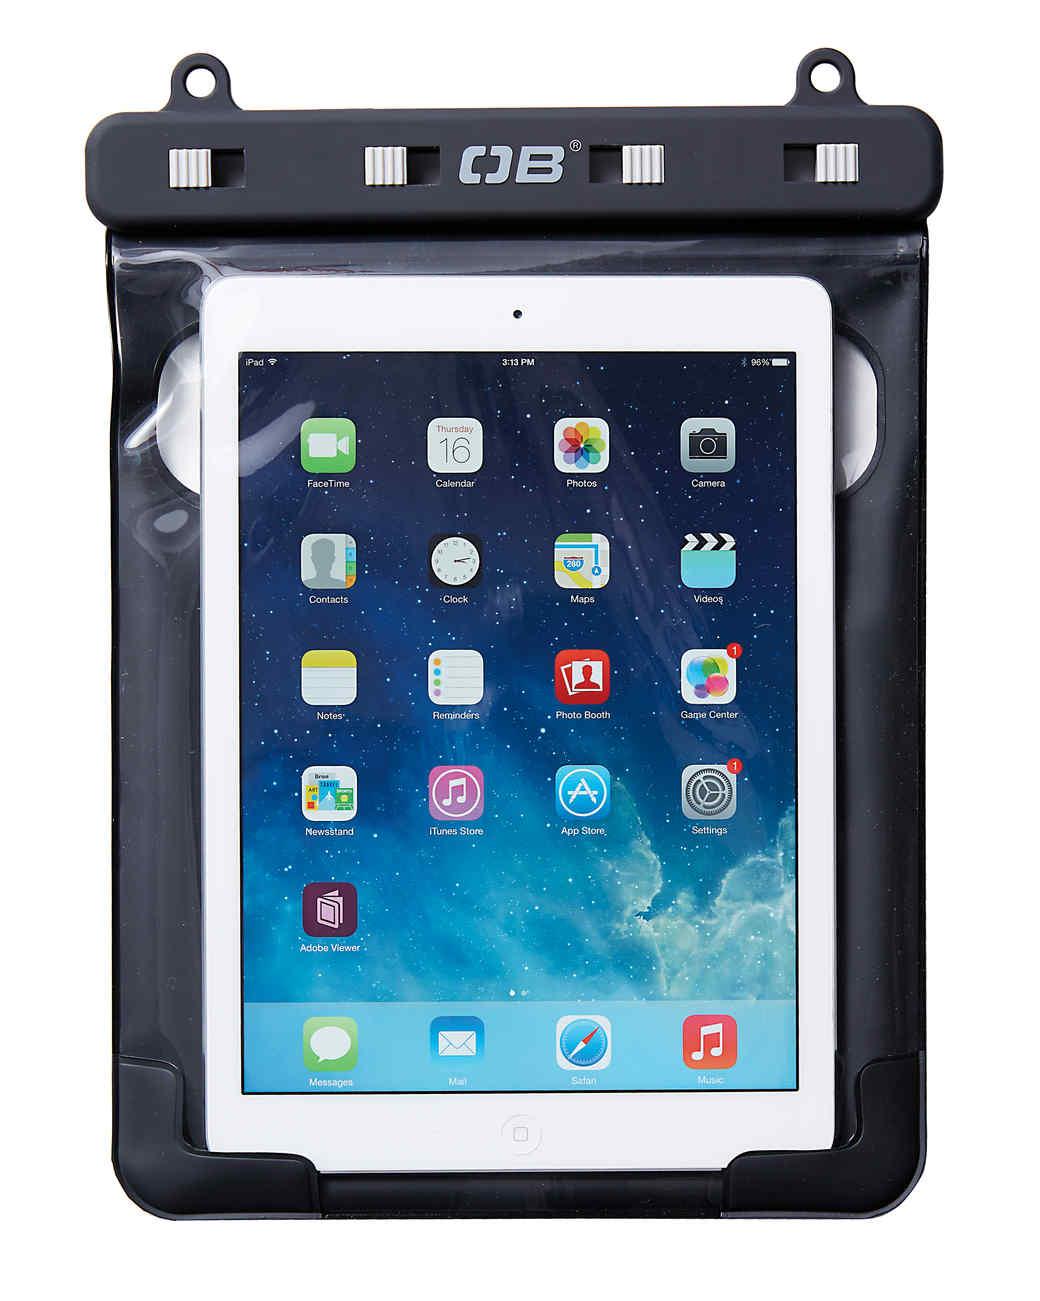 waterproof-ipad-case-0007-d112094.jpg